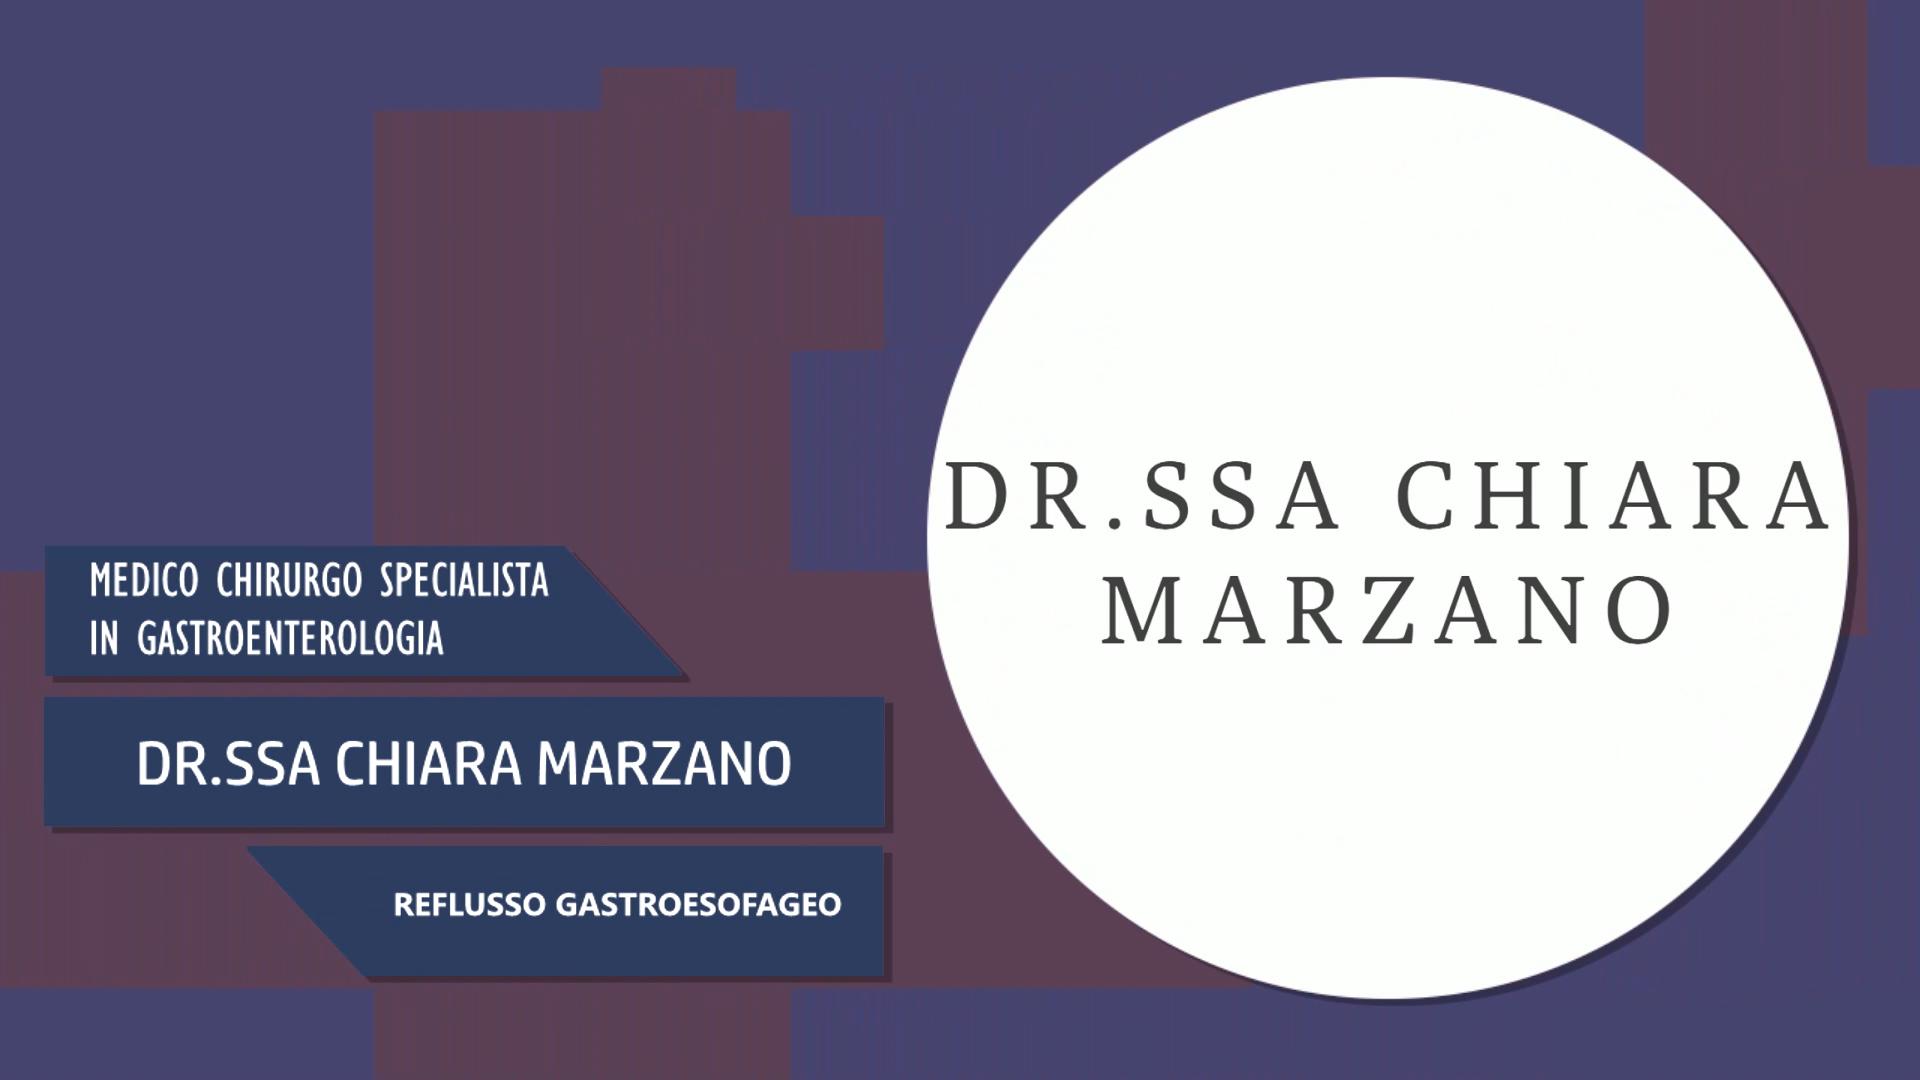 Dott.ssa Chiara Marzano – Reflusso Gastroesofageo